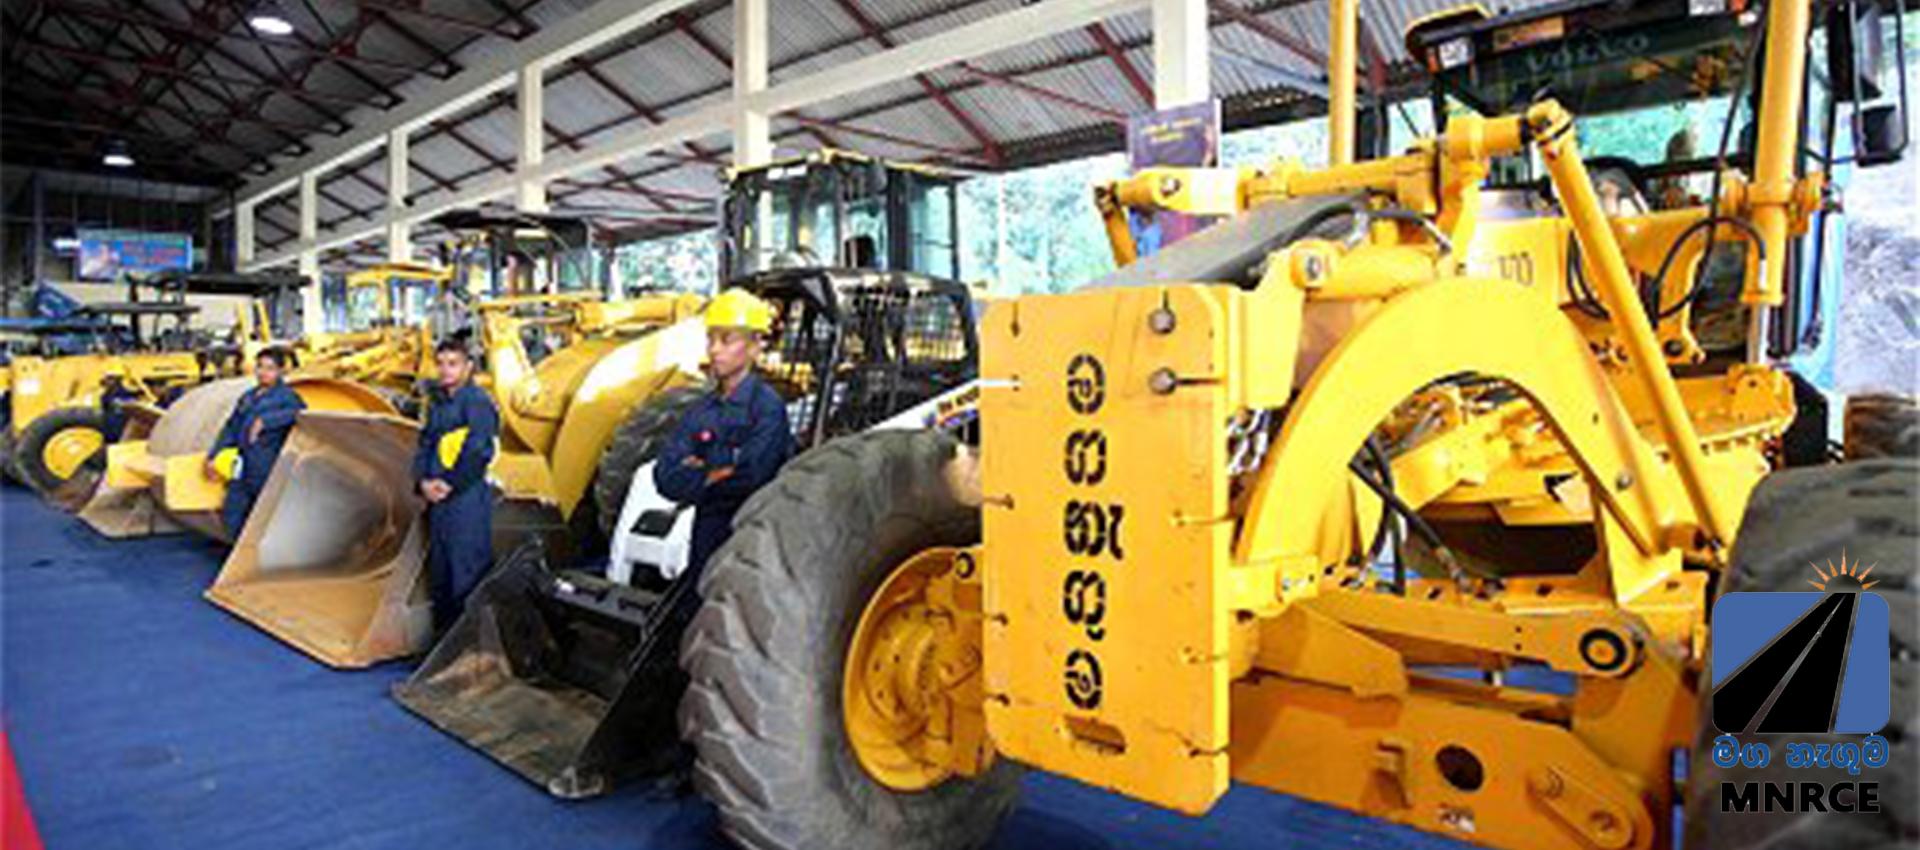 Yesman.lk - Cover Image - MagaNeguma Construction Equipment Training School